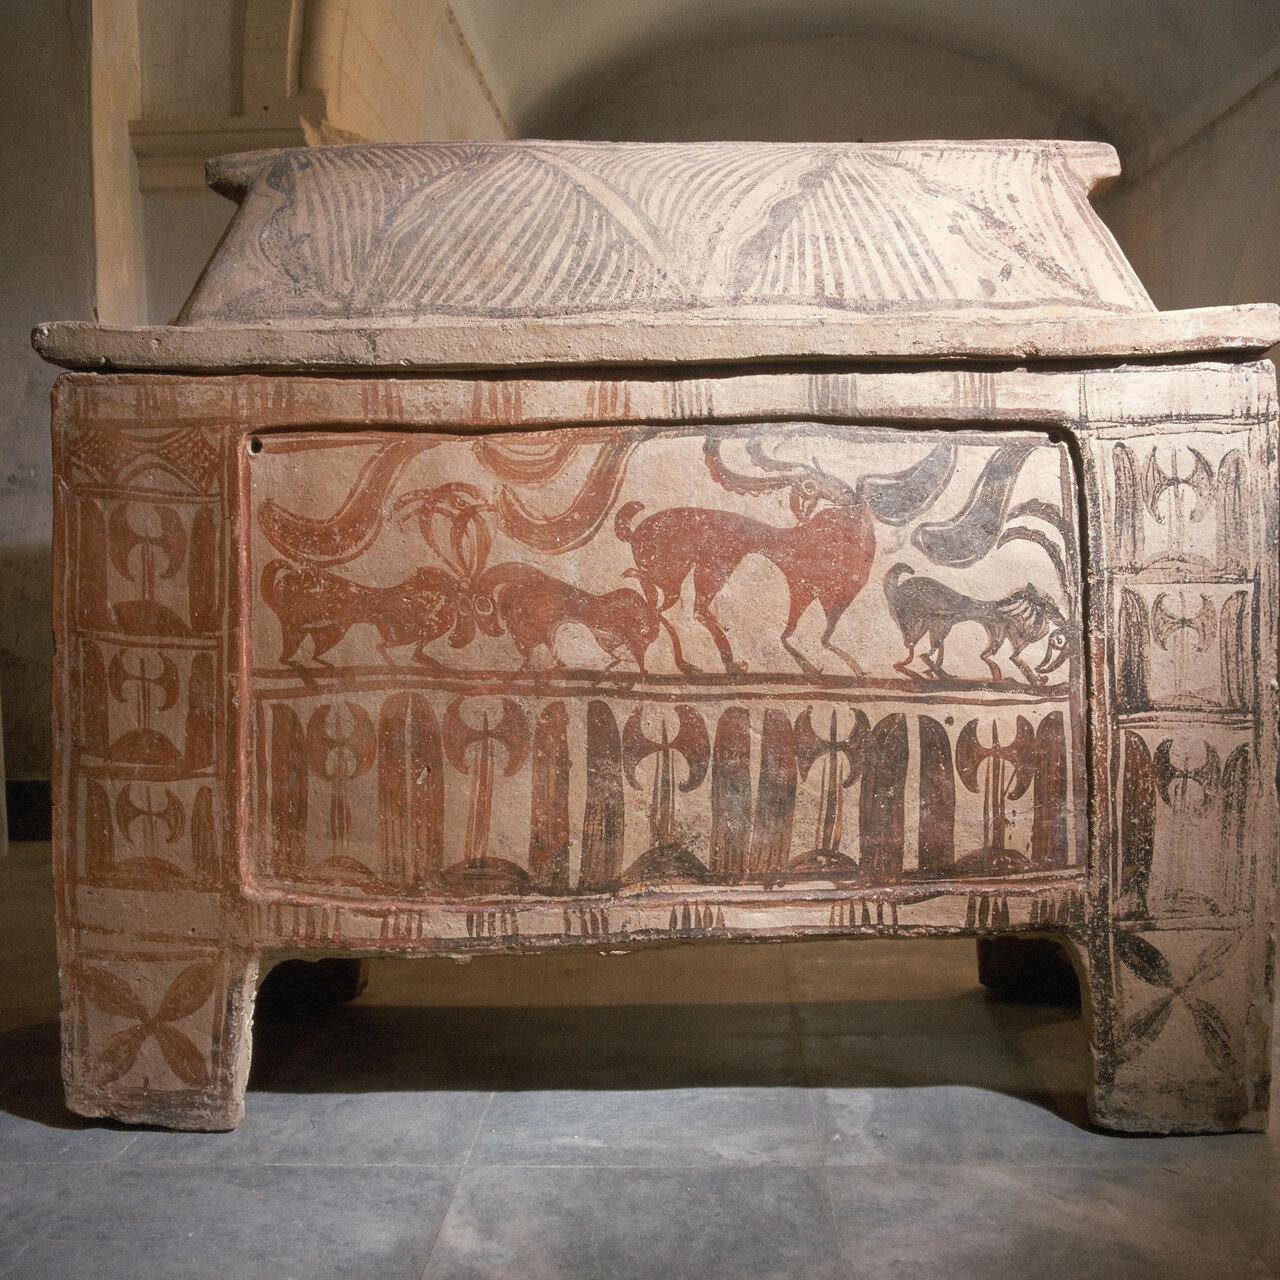 Ханьи. Археологический музей. Саркофаг из минойского кладбища Армени. XIII век до н.э.